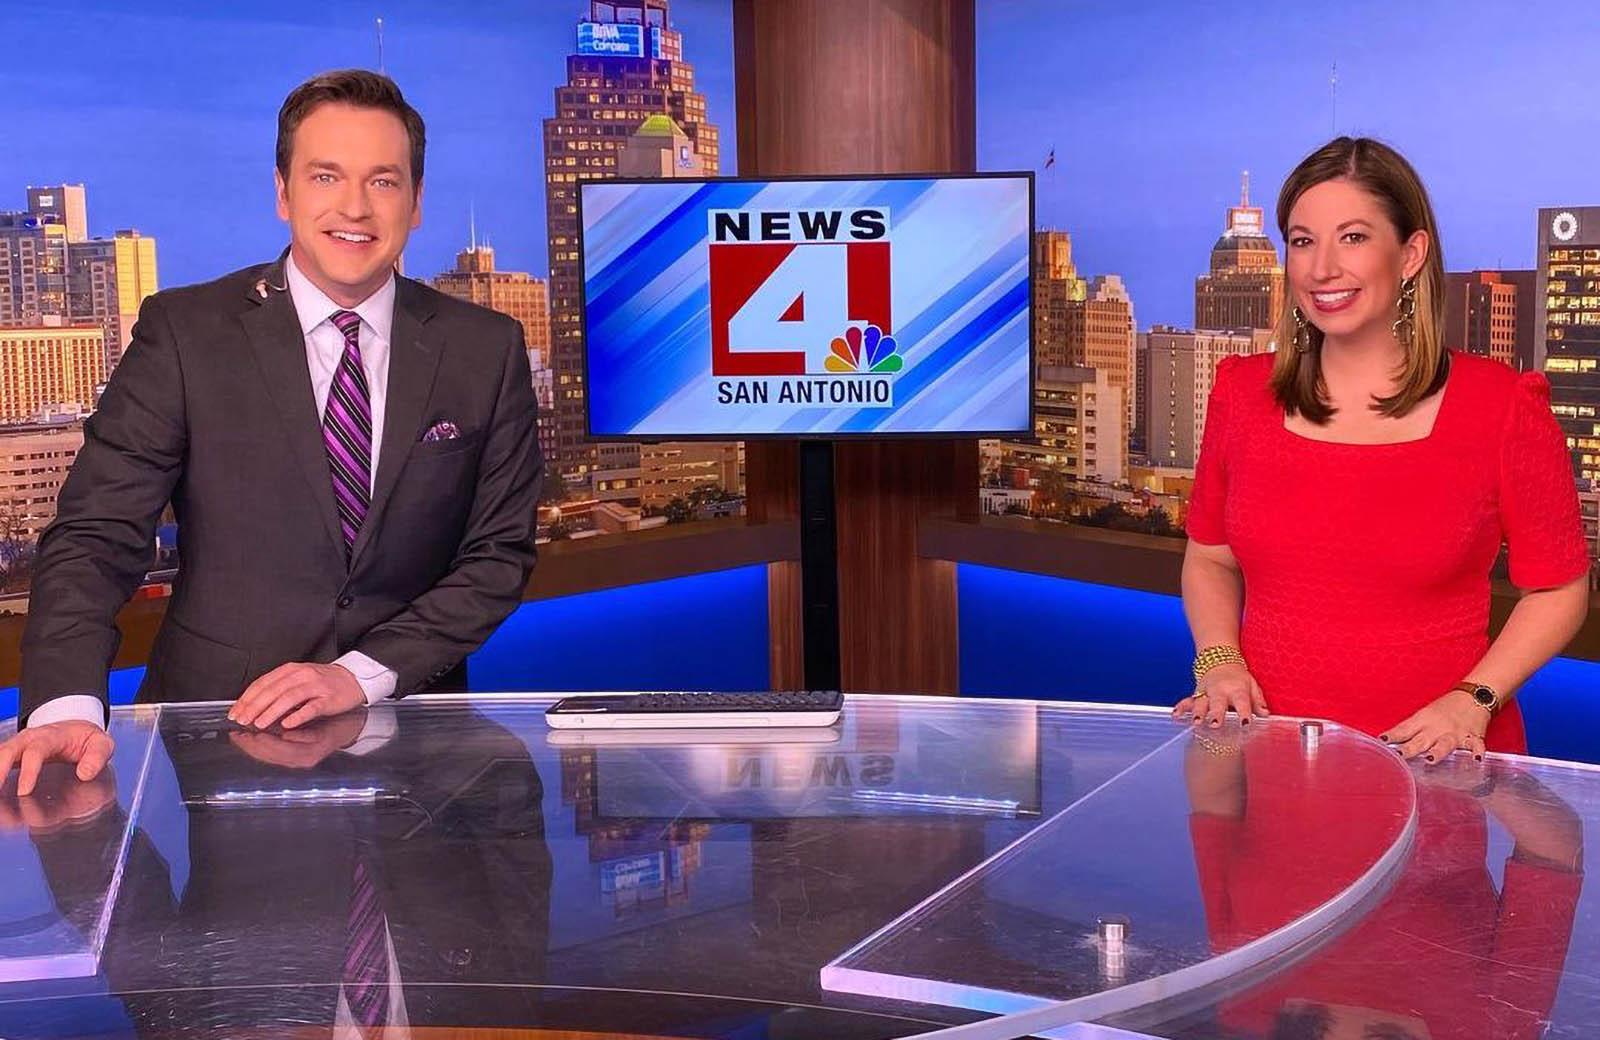 Robert Price and Emily Baucum covering news updates for News 4 San Antonio